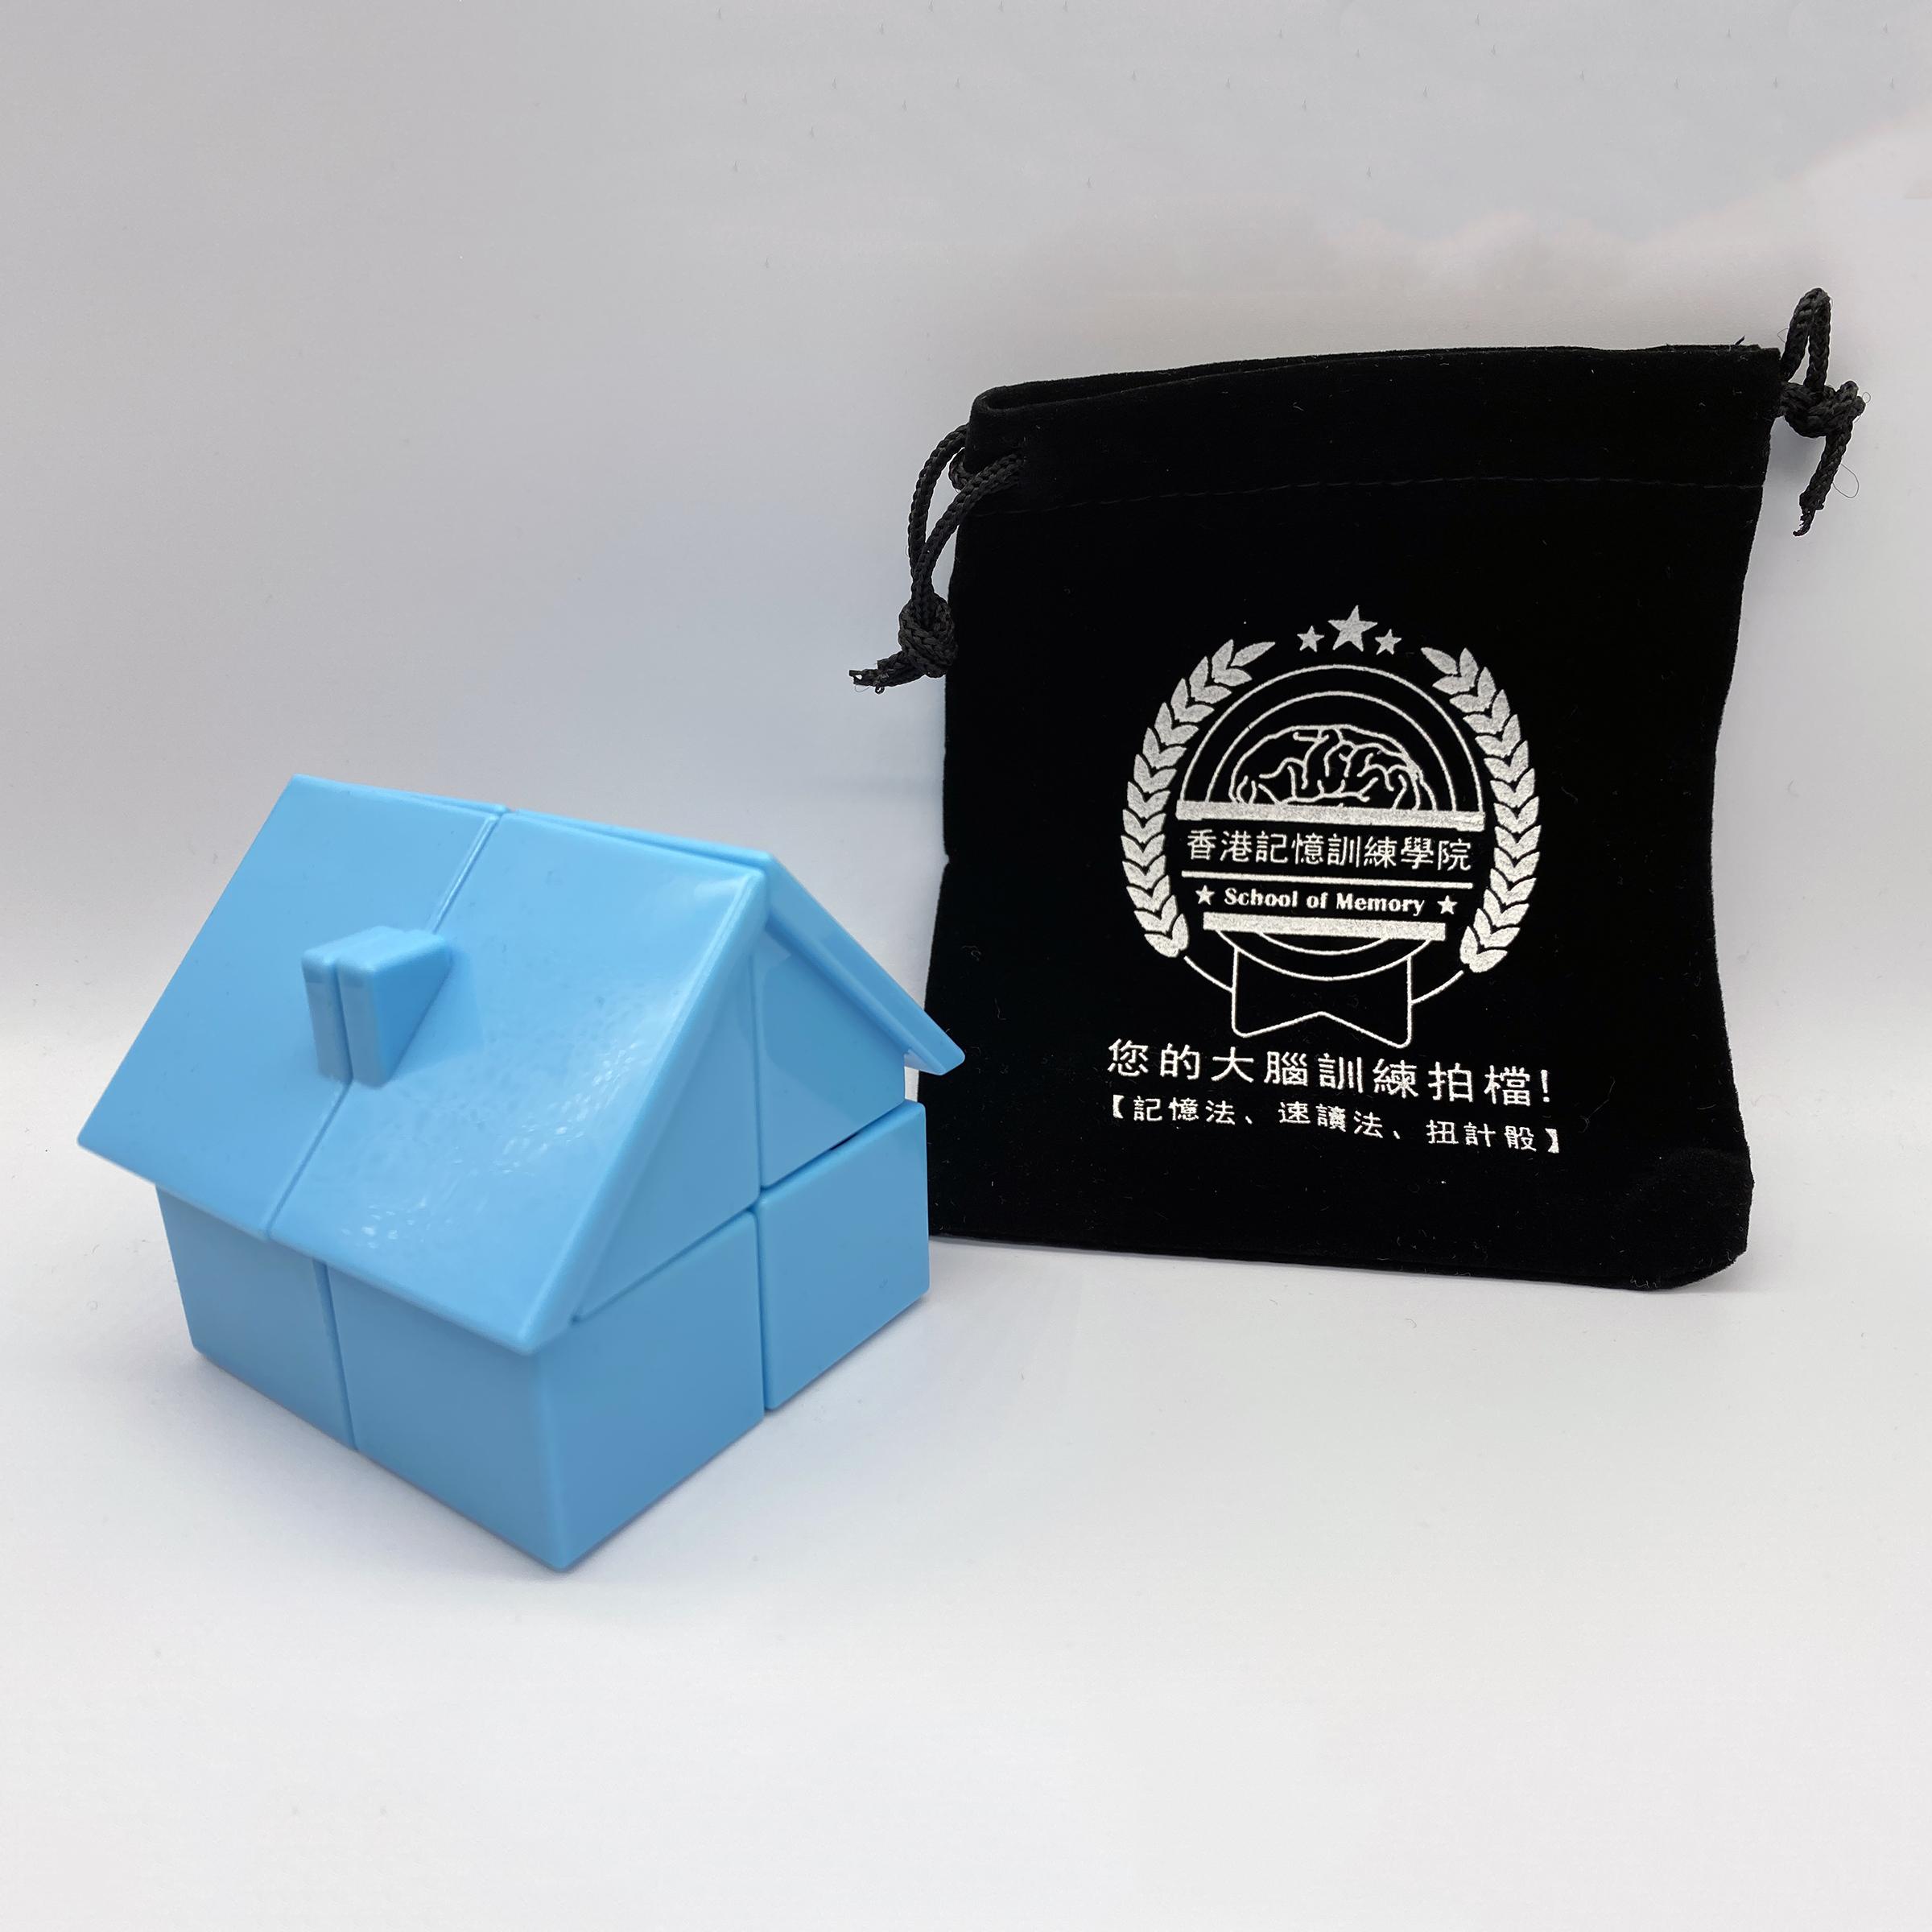 2x2 Rubik (House) 二階扭計骰 (屋)